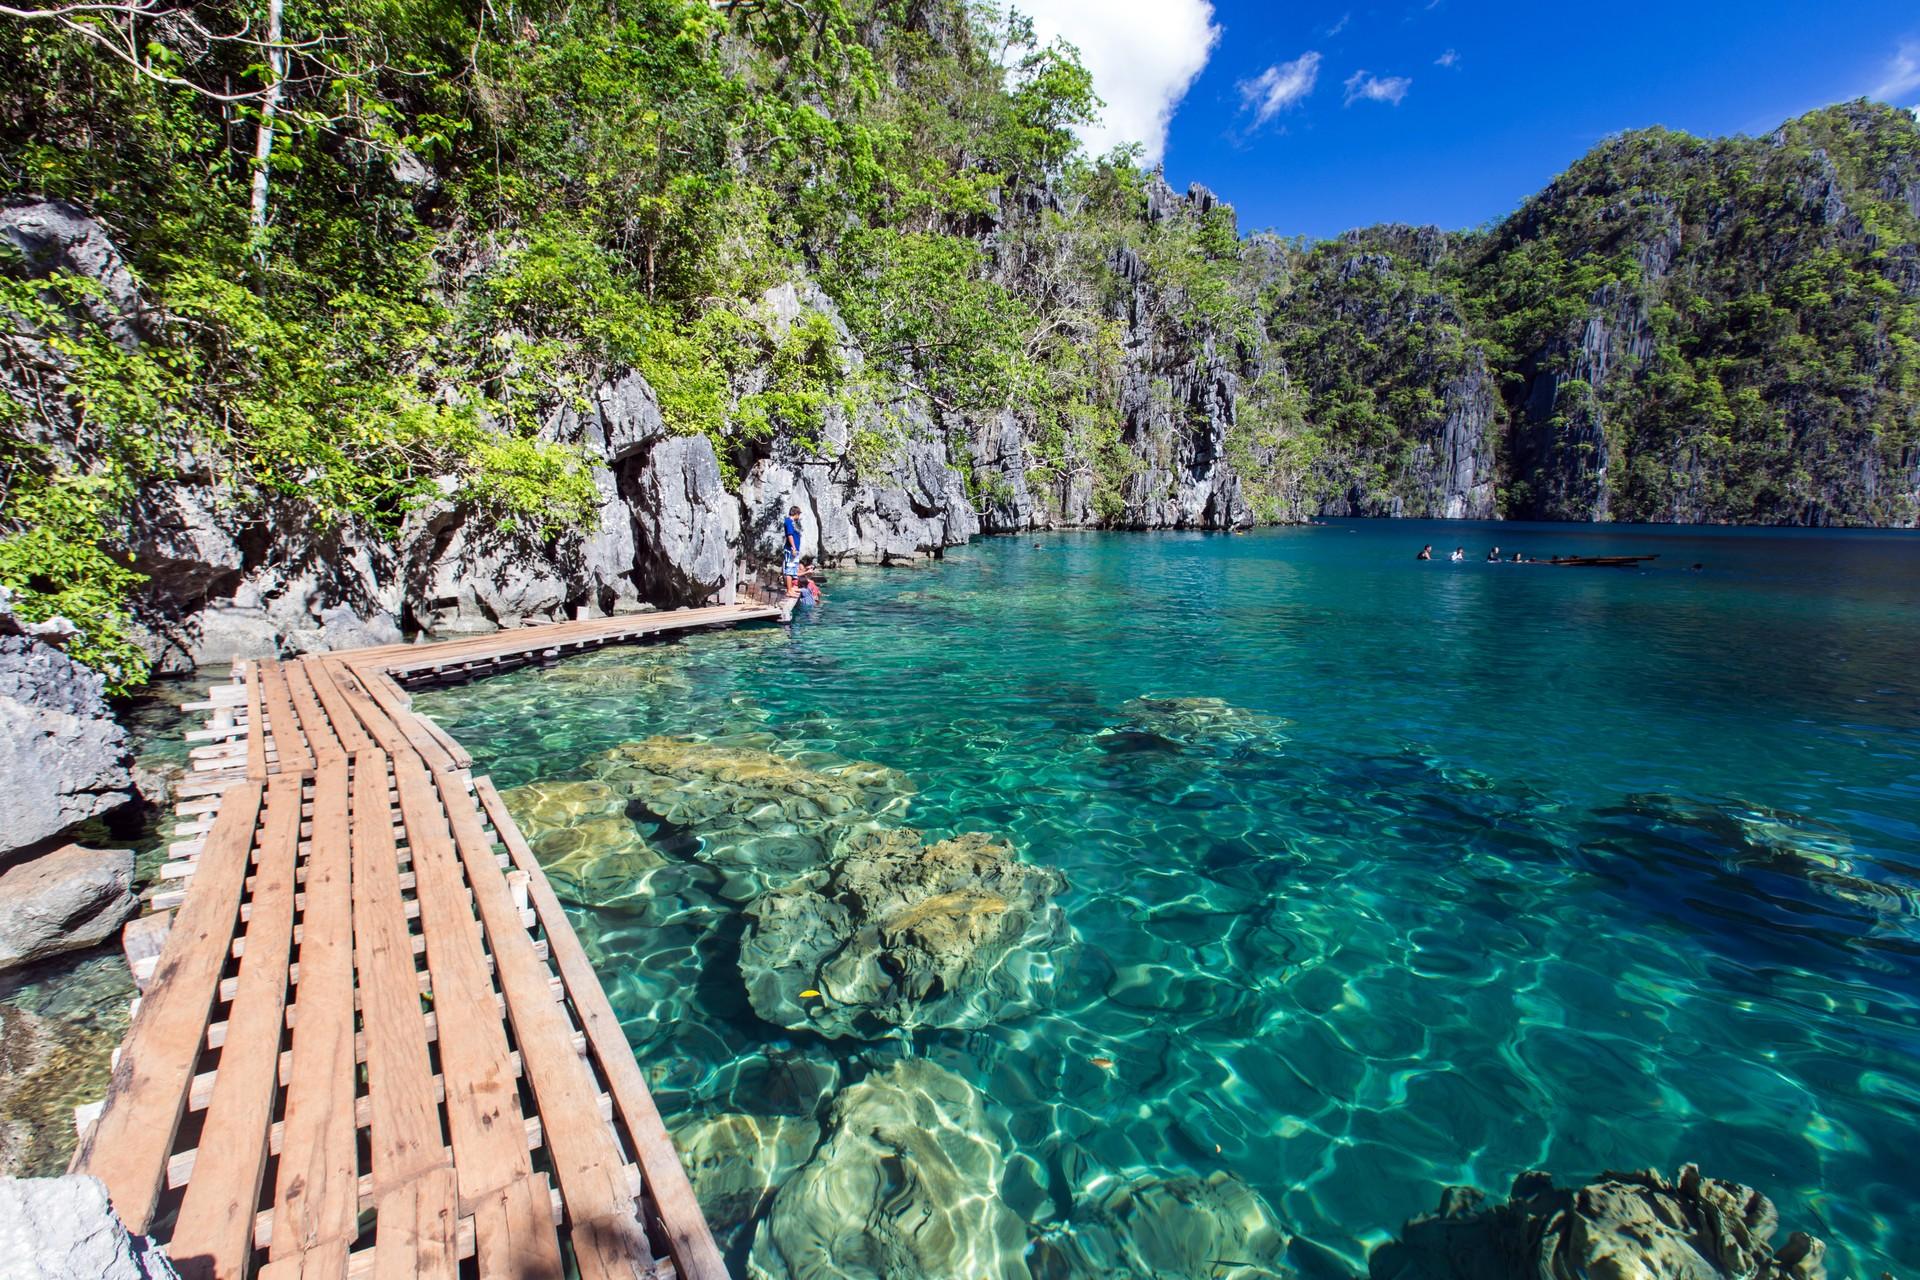 The lagoons of Coron Island